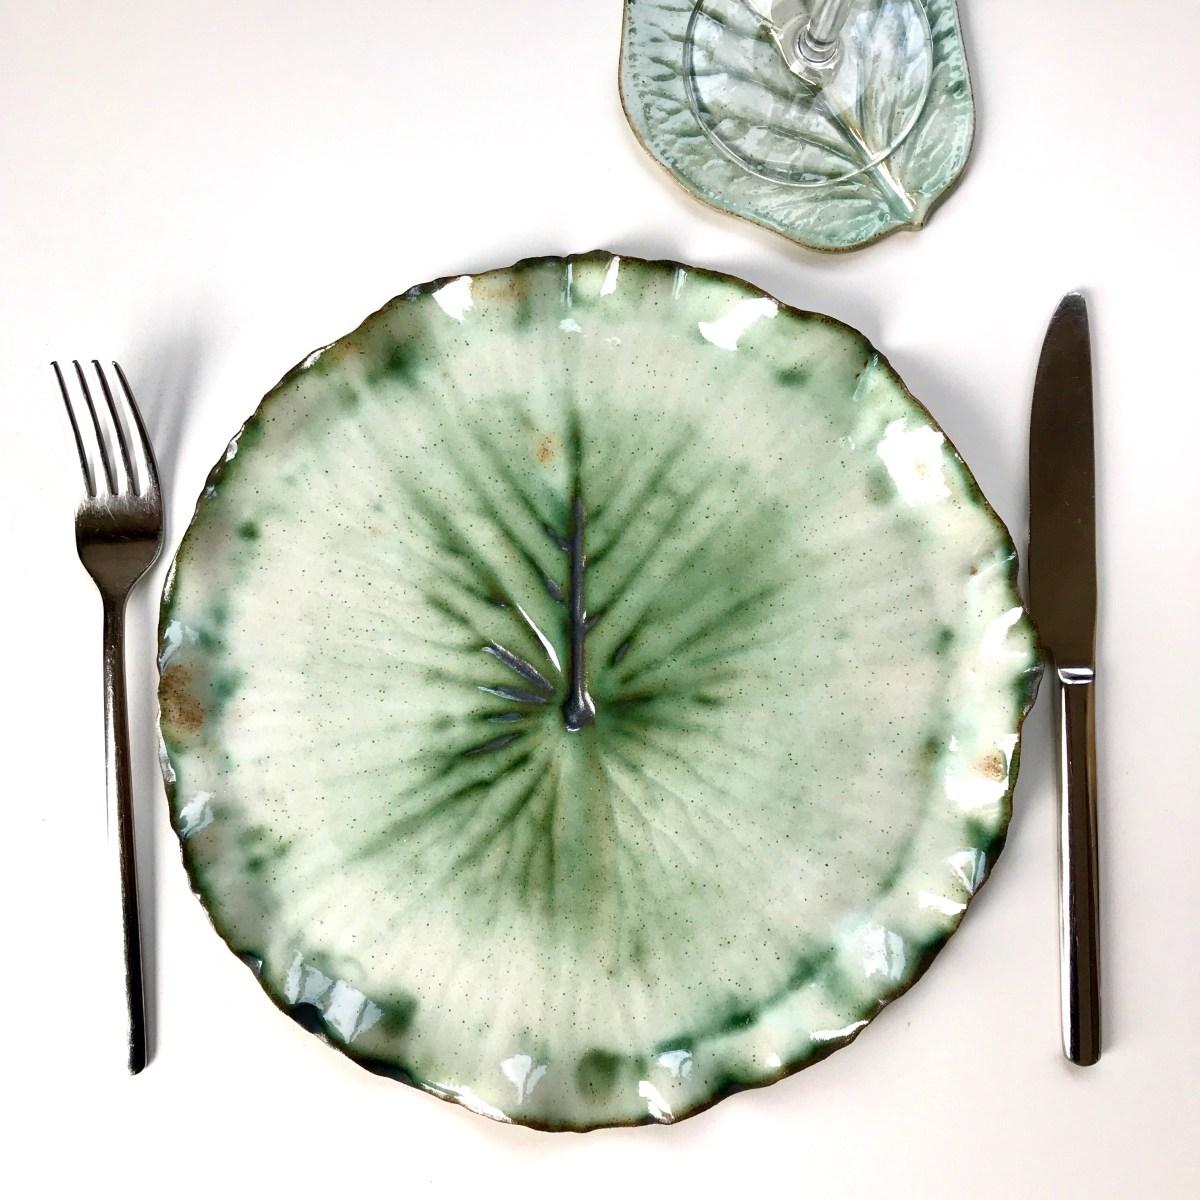 Pond Lily Leaf Dinner Plate by Sonya Ceramic Art 'Ready for Dinner'